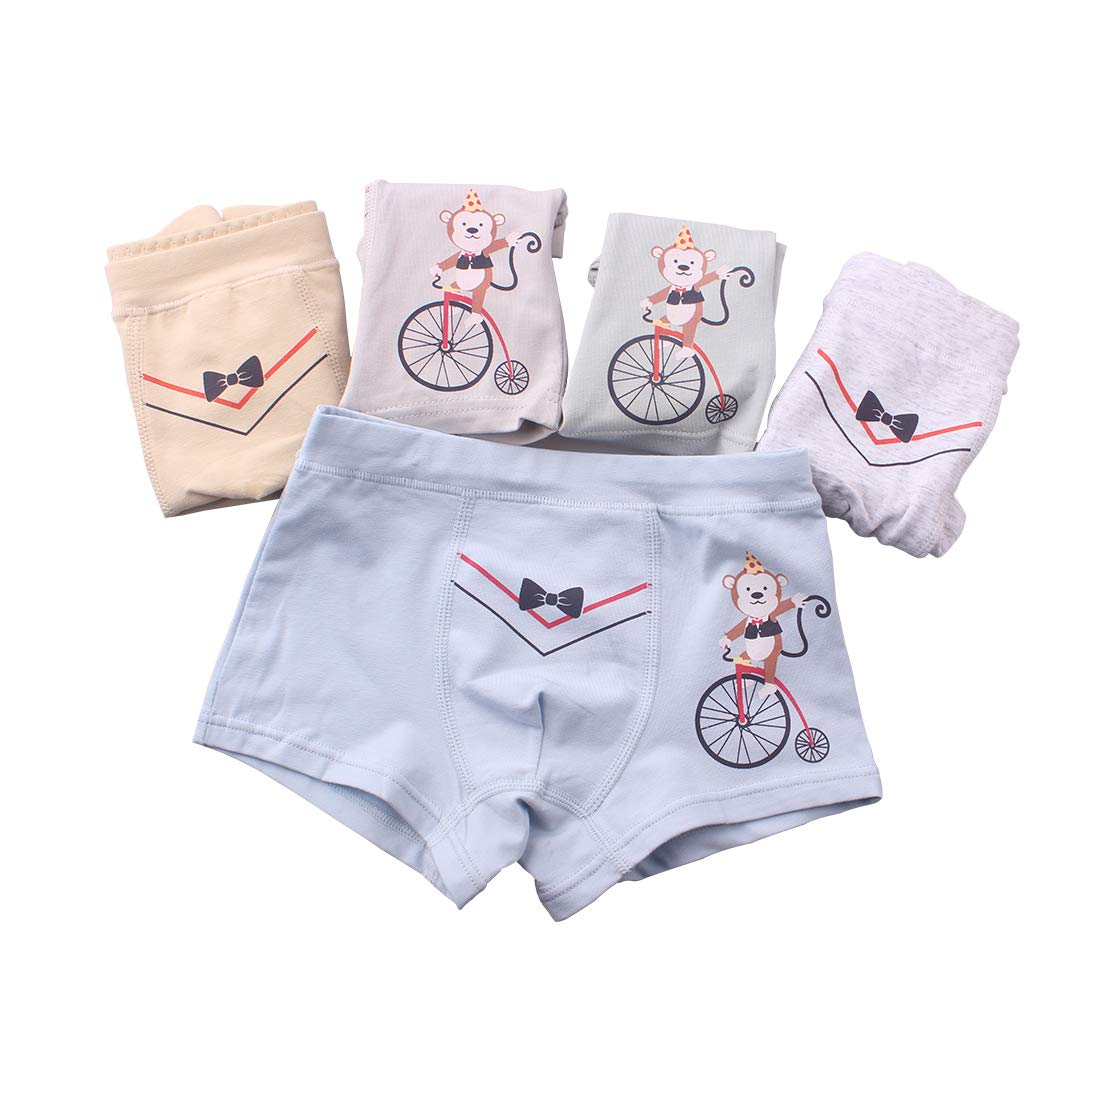 KimmyKu 新品 Toddler Kids Little Boys Organic Cotton Underwear Panties Shorts Shorty with Lovely Monkey 8 9 10 Years by KimmyKu